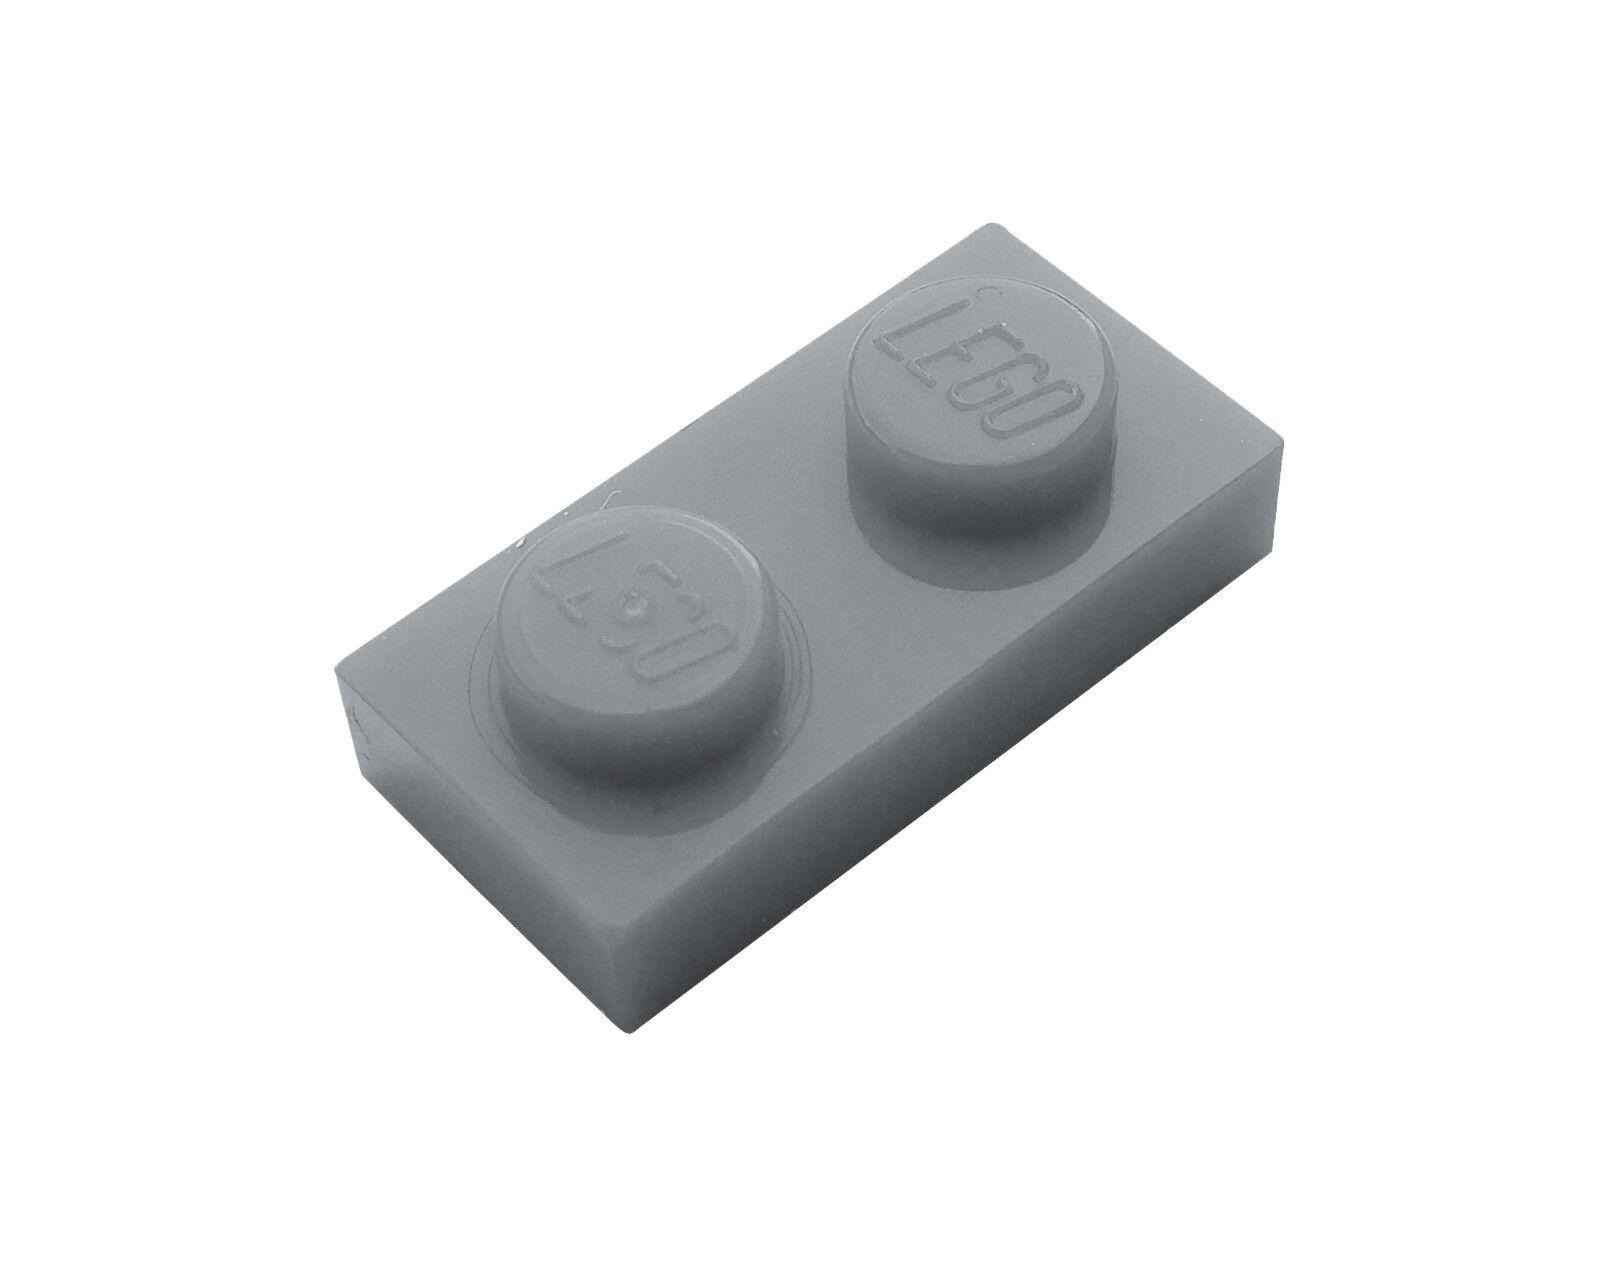 2x LEGO® 3033 6x10 Platte neu-hellgrau NEU light bluish gray plate